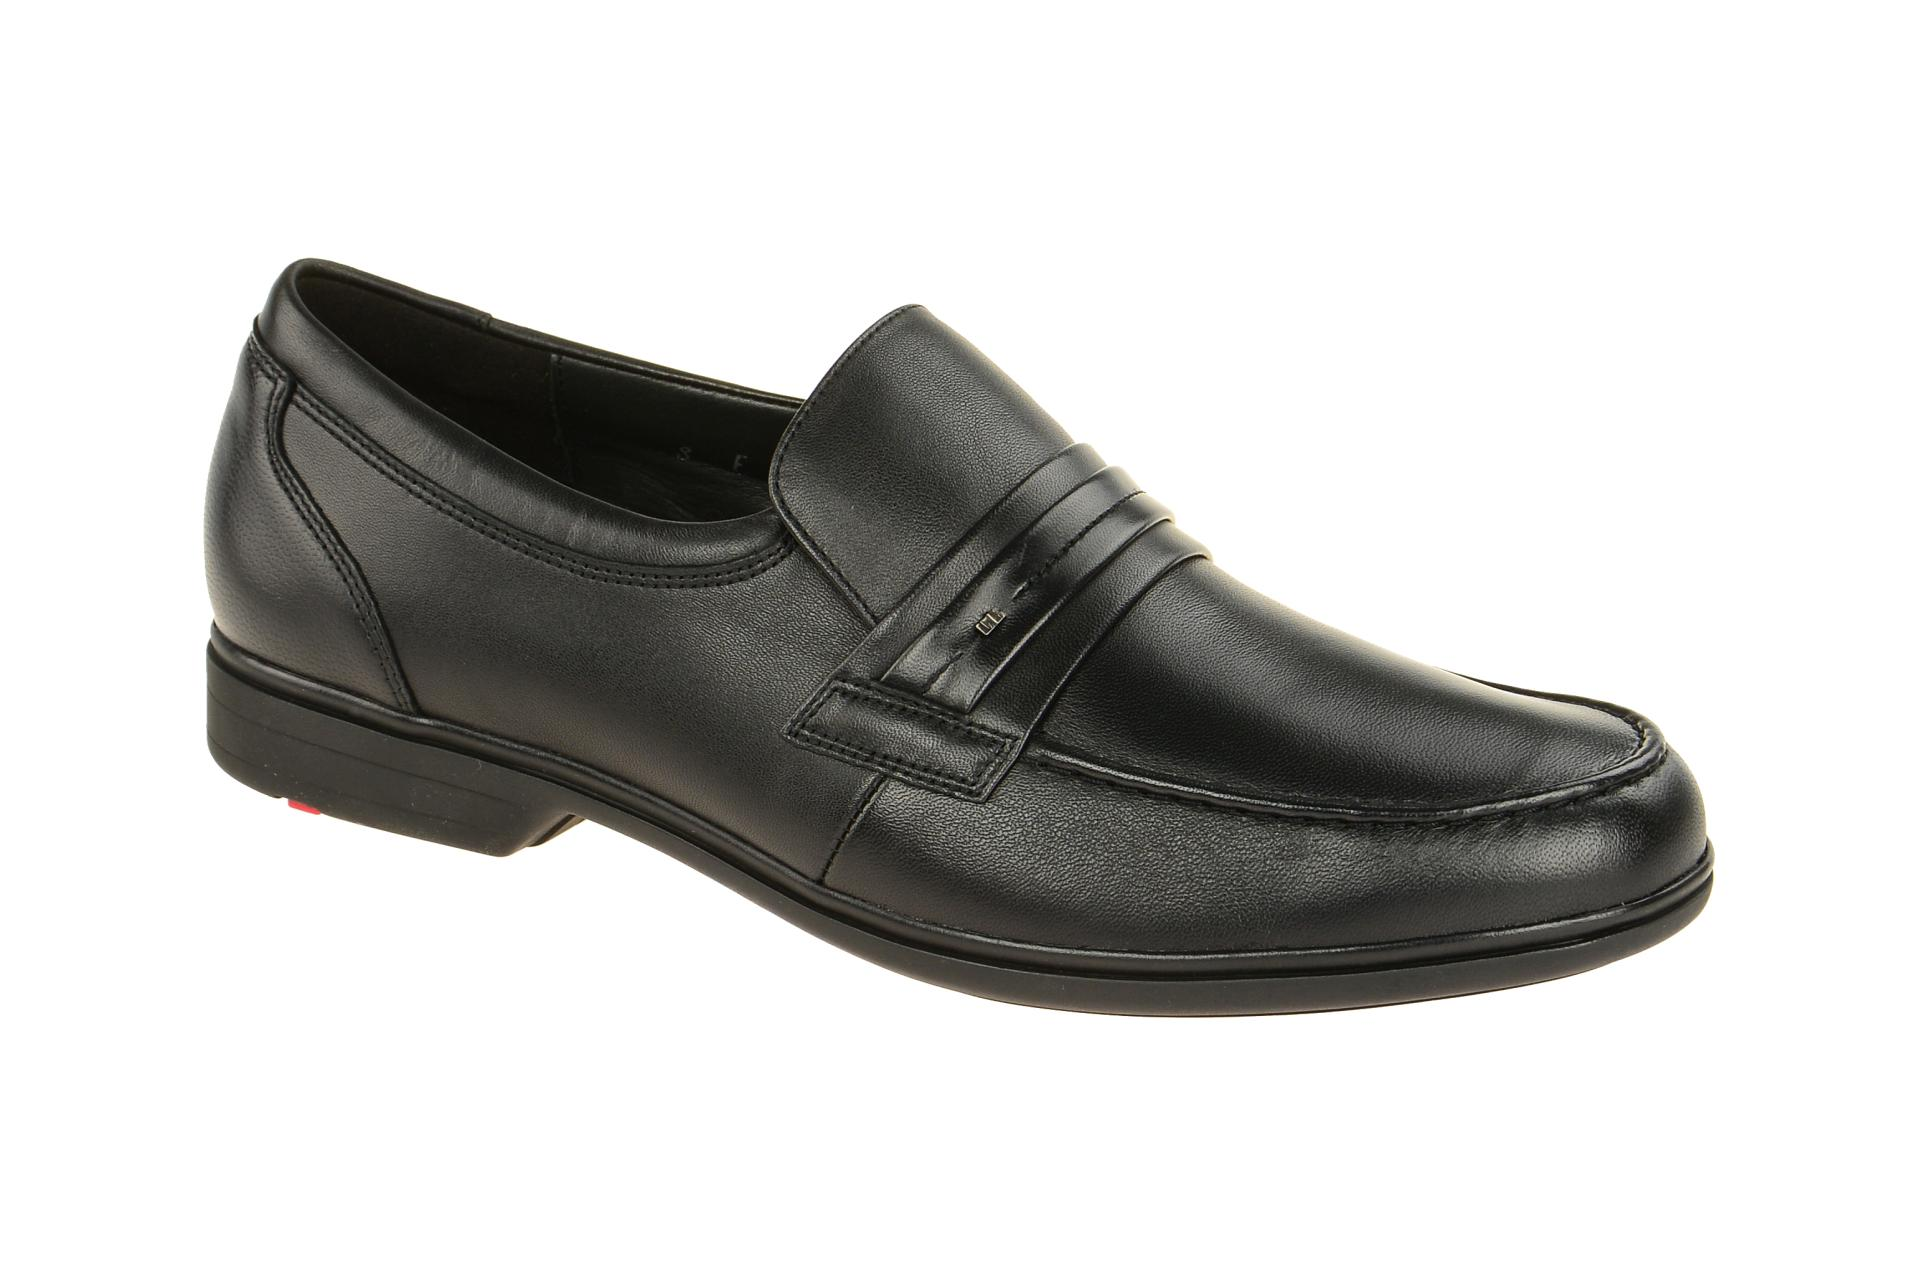 lloyd schuhe robin schwarz herrenschuhe elegante slipper 27 760 00 neu ebay. Black Bedroom Furniture Sets. Home Design Ideas